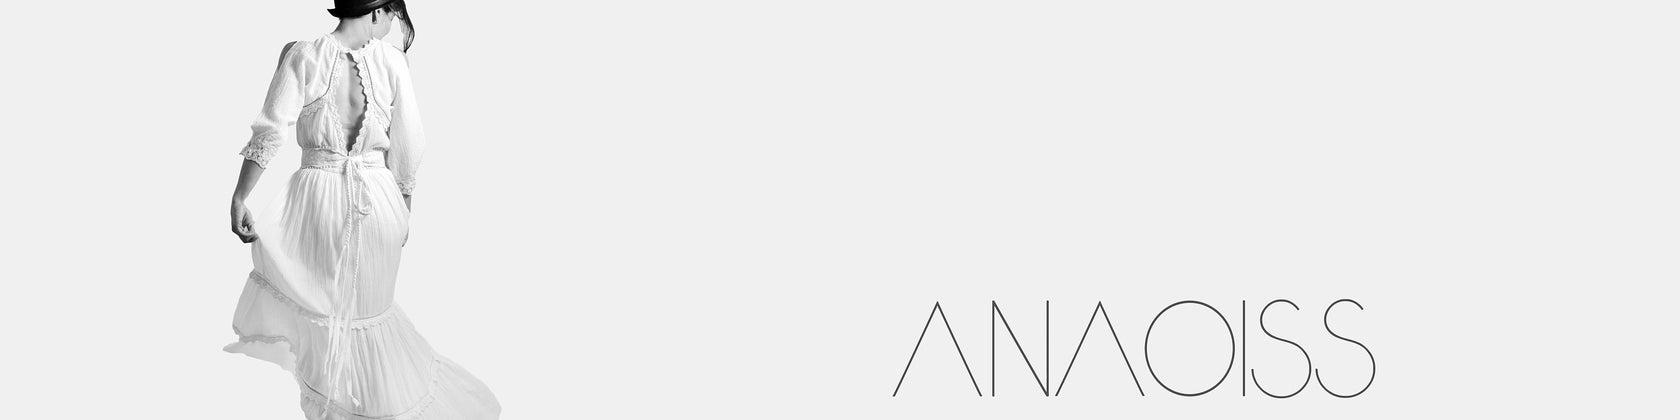 Simplicity is the keynote of all true elegance CC por Anaoiss